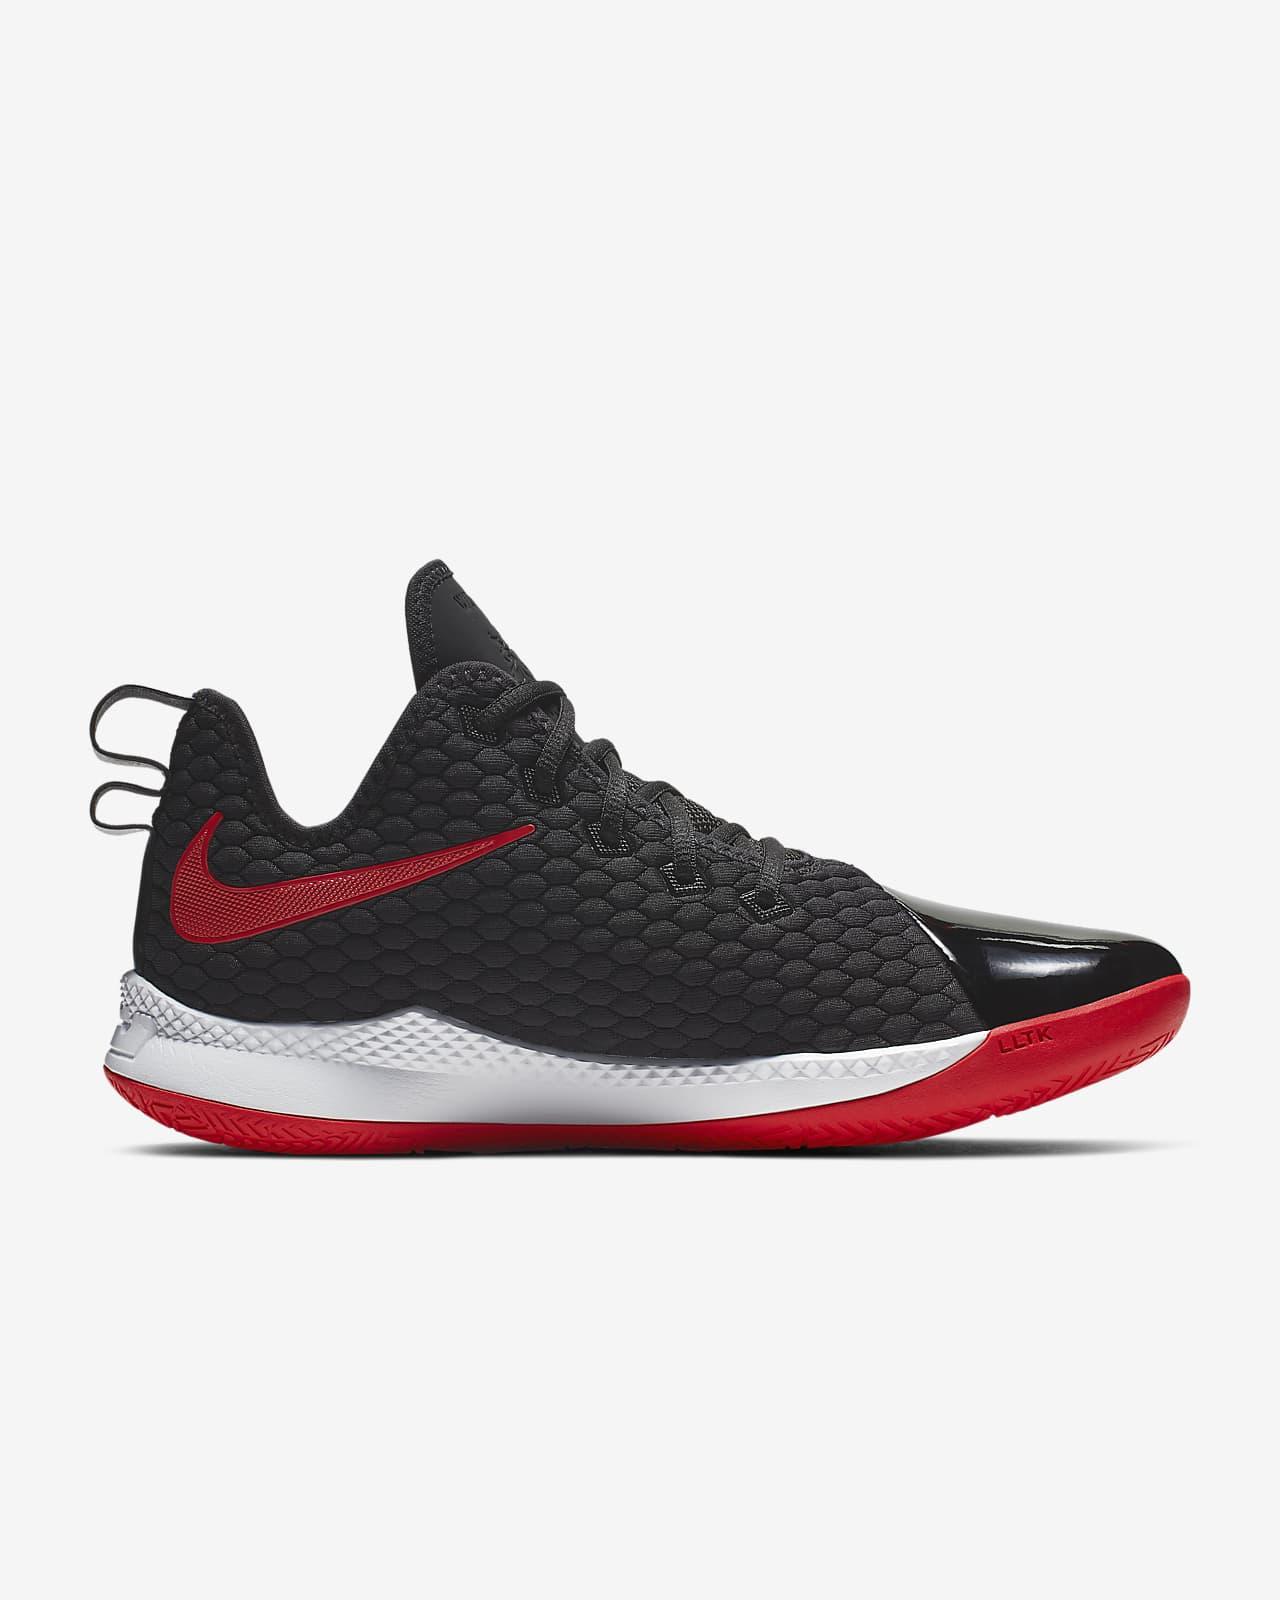 LeBron Witness 3 PRM Basketball Shoe